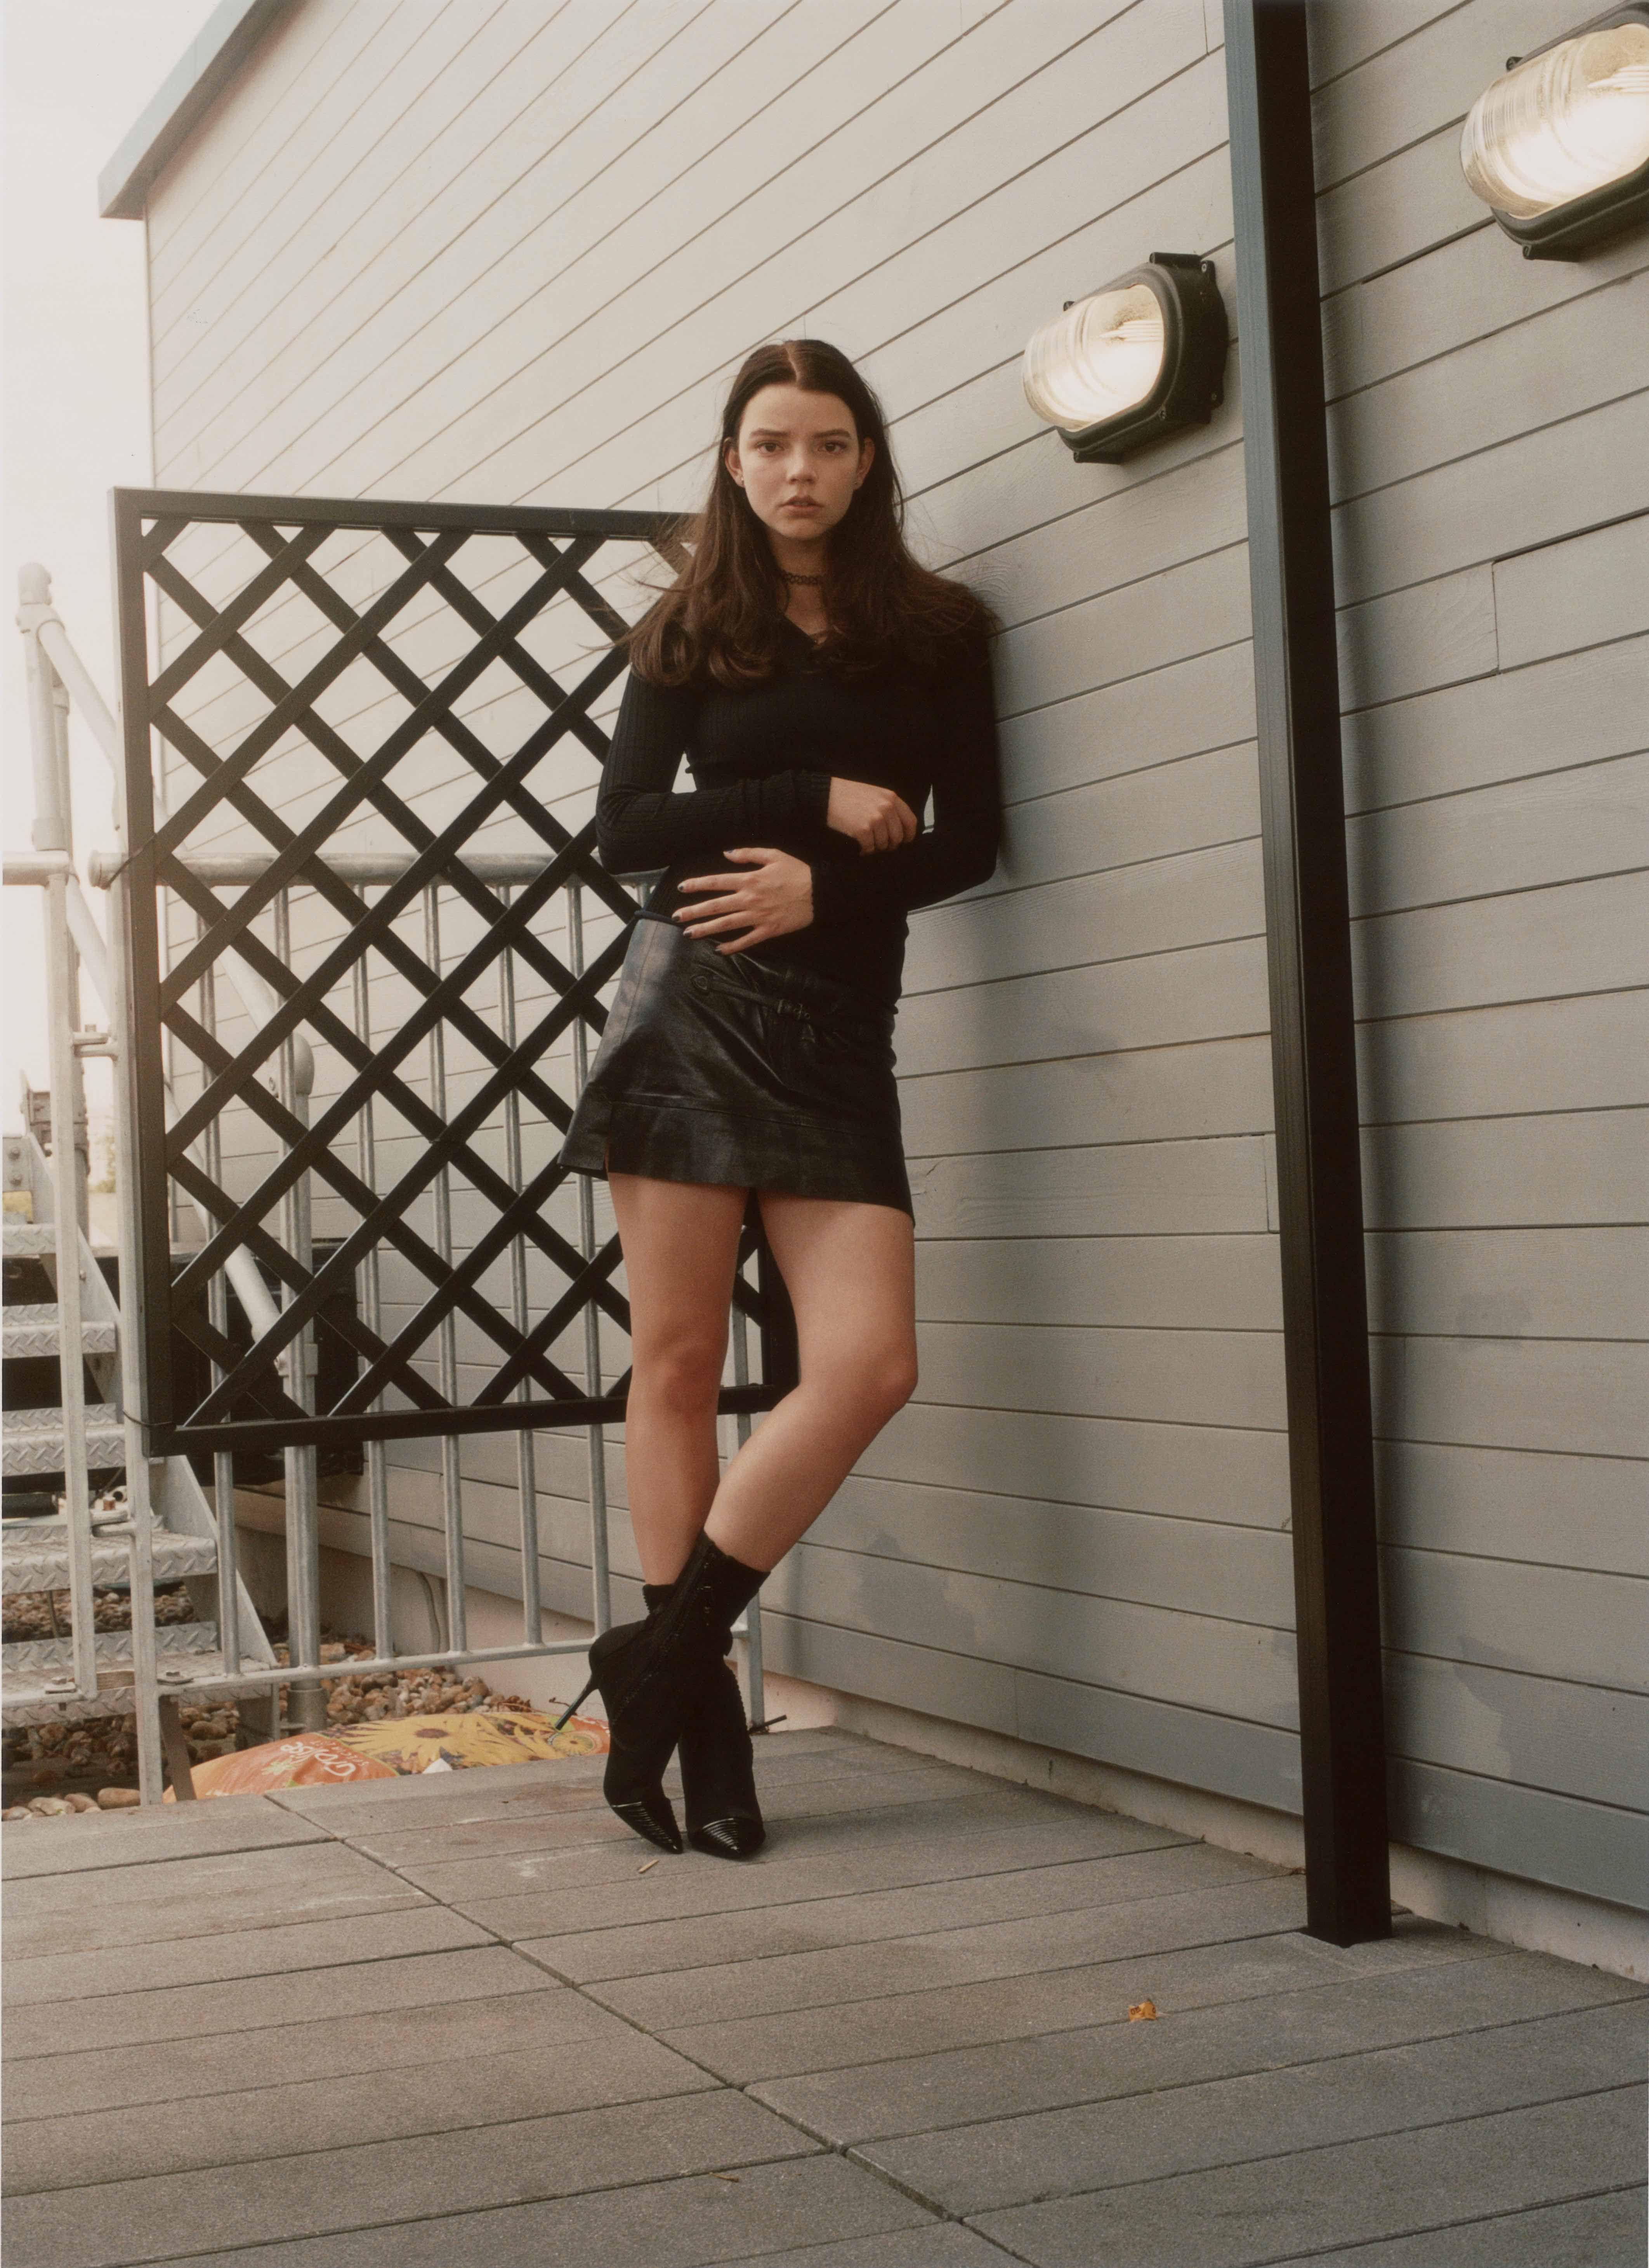 Anya Taylor-Joy | Anya taylor joy, Emma watson, Actresses